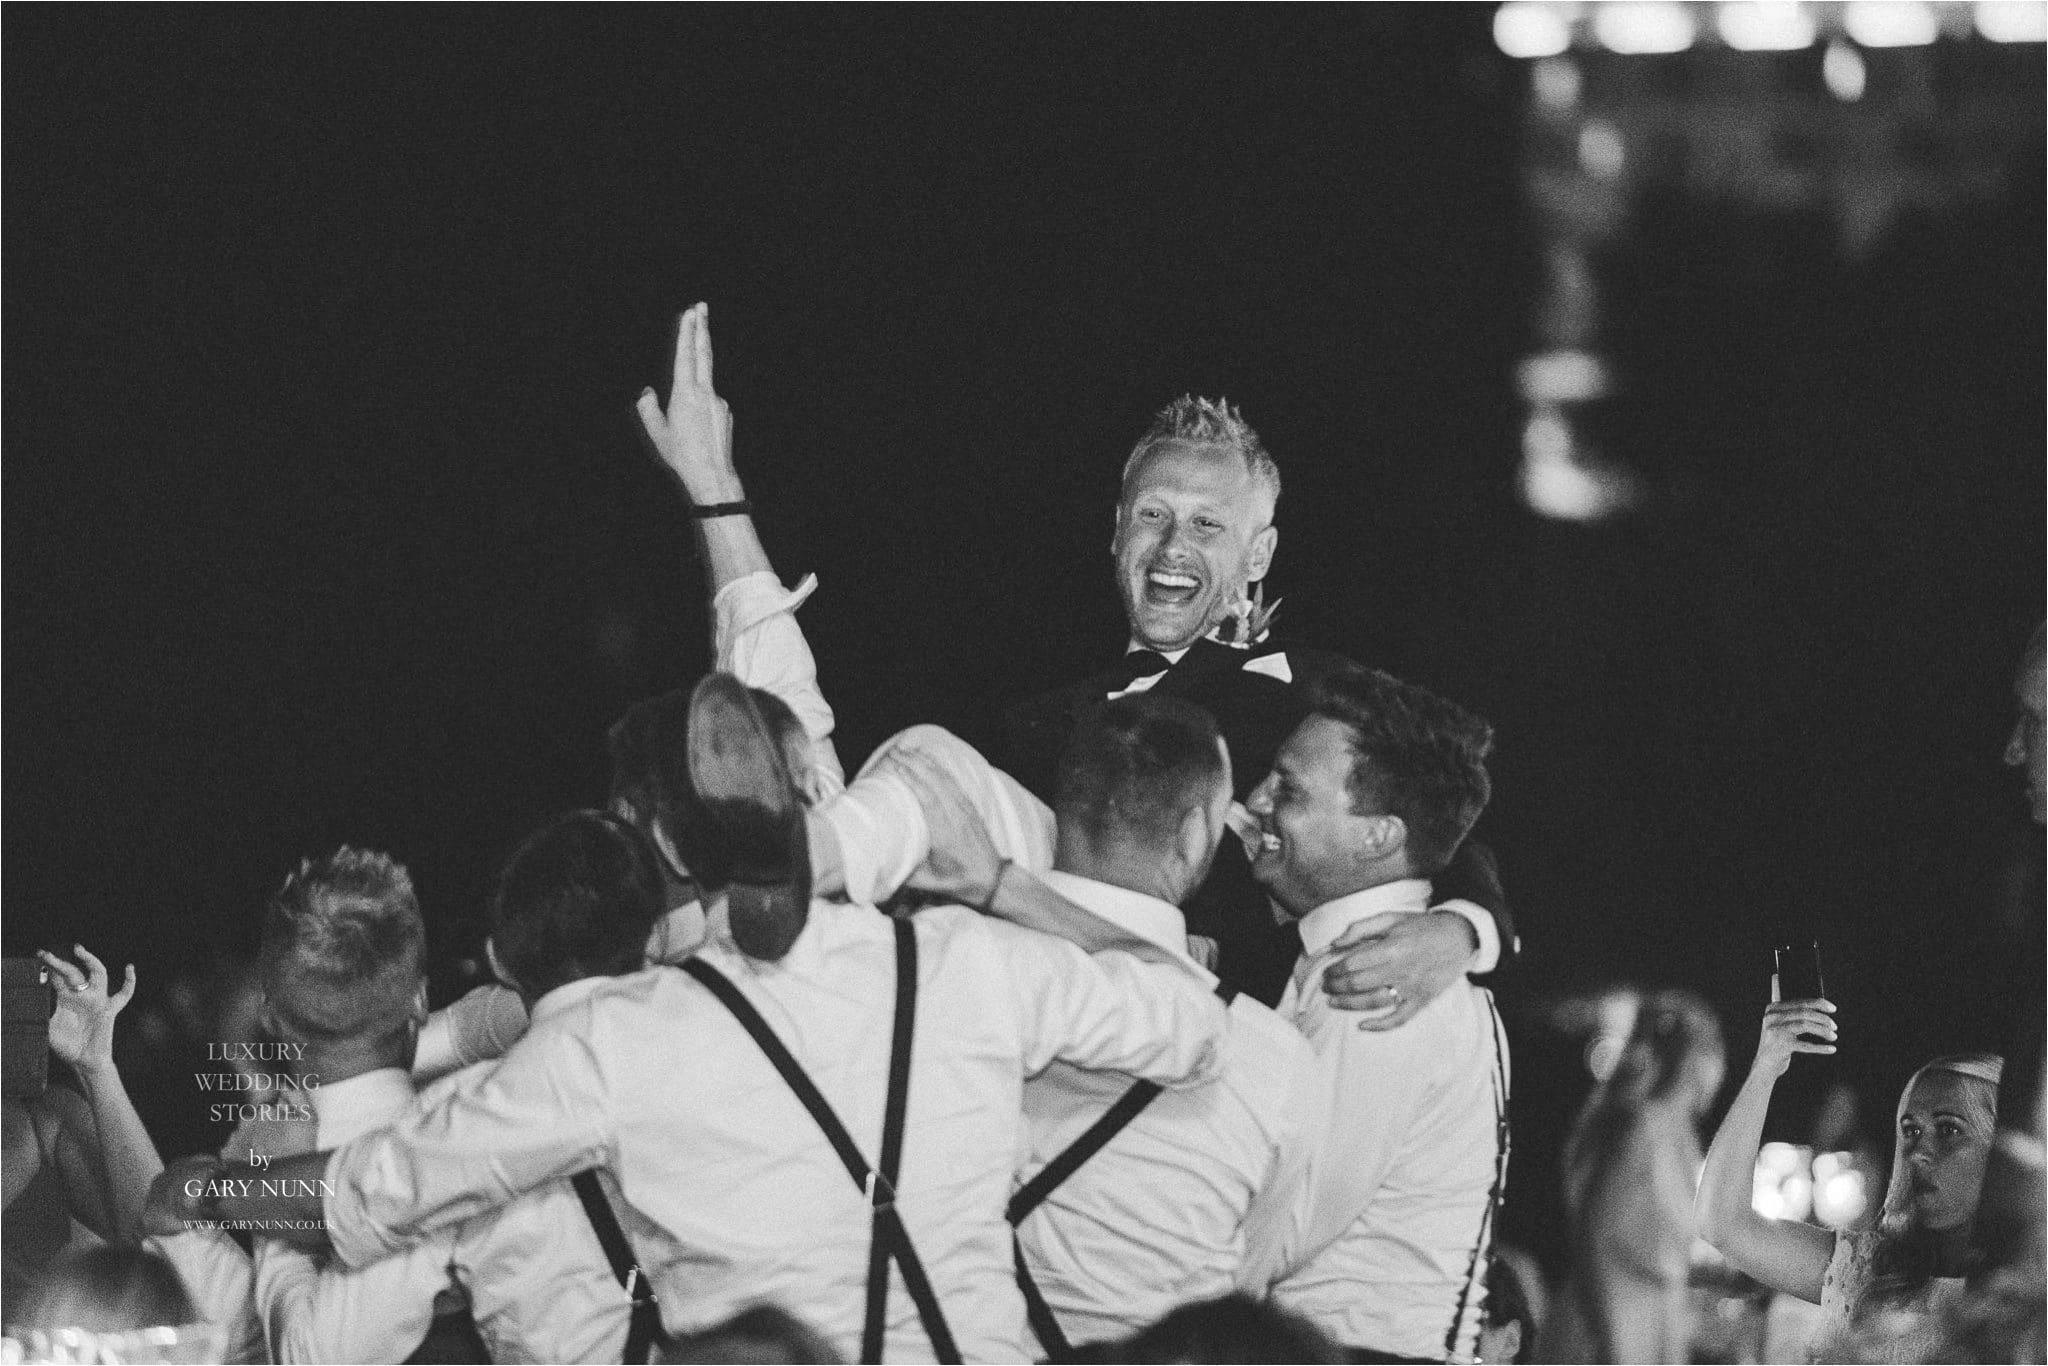 questions to ask a wedding photographer, belmond grand hotel timeo, destination wedding photographer italy, Gary Nunn Photography, grand hotel timeo, mount etna, sicily, sicily wedding photography, top 10 wedding photographers, wedding photograpgher leighton buzzard, weddings in Taormina